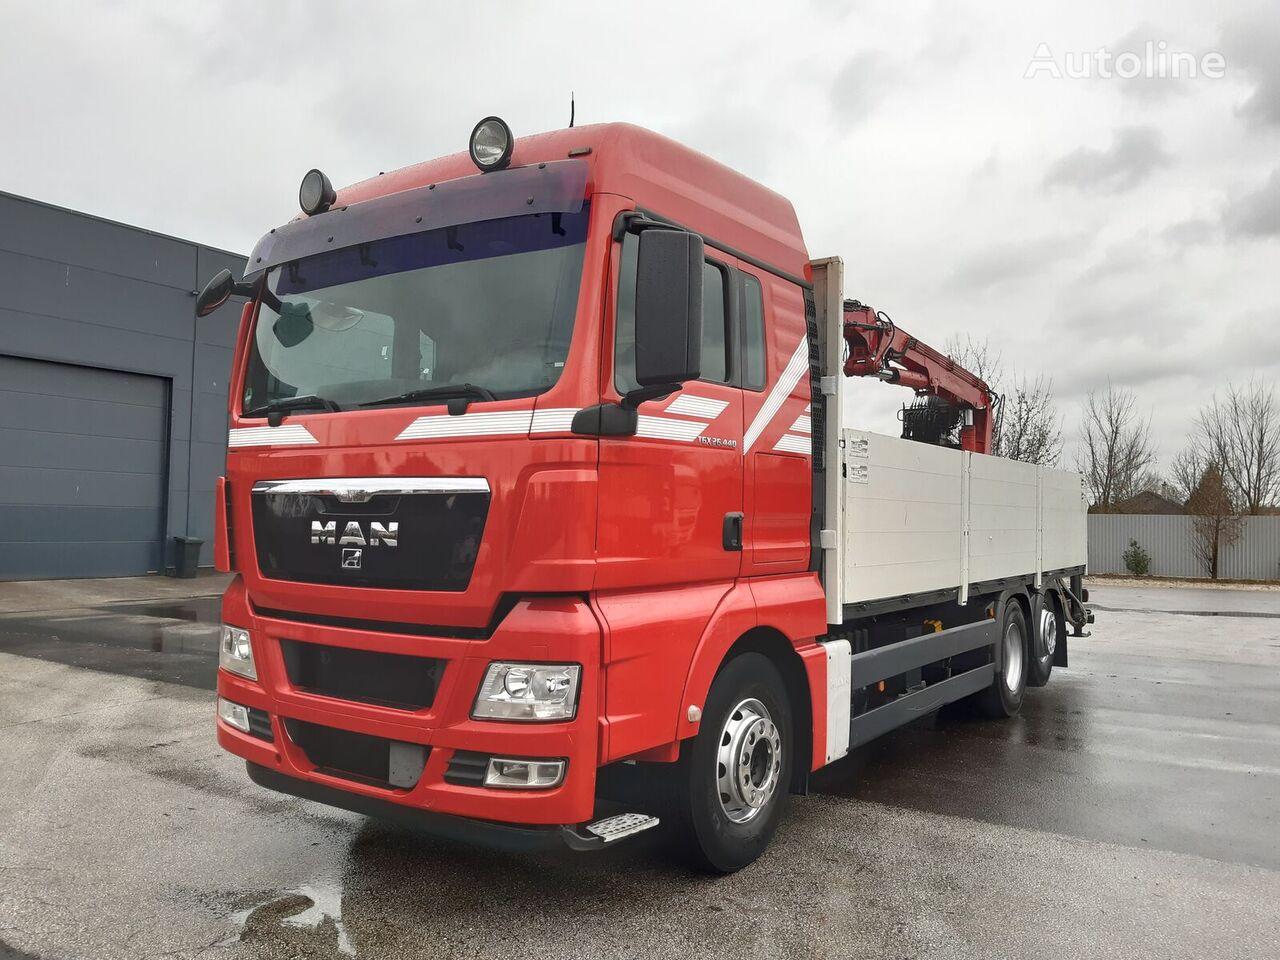 MAN TGX 26.440 6x2 EU5 ATLAS DARU FORDULÓ BOGI flatbed truck